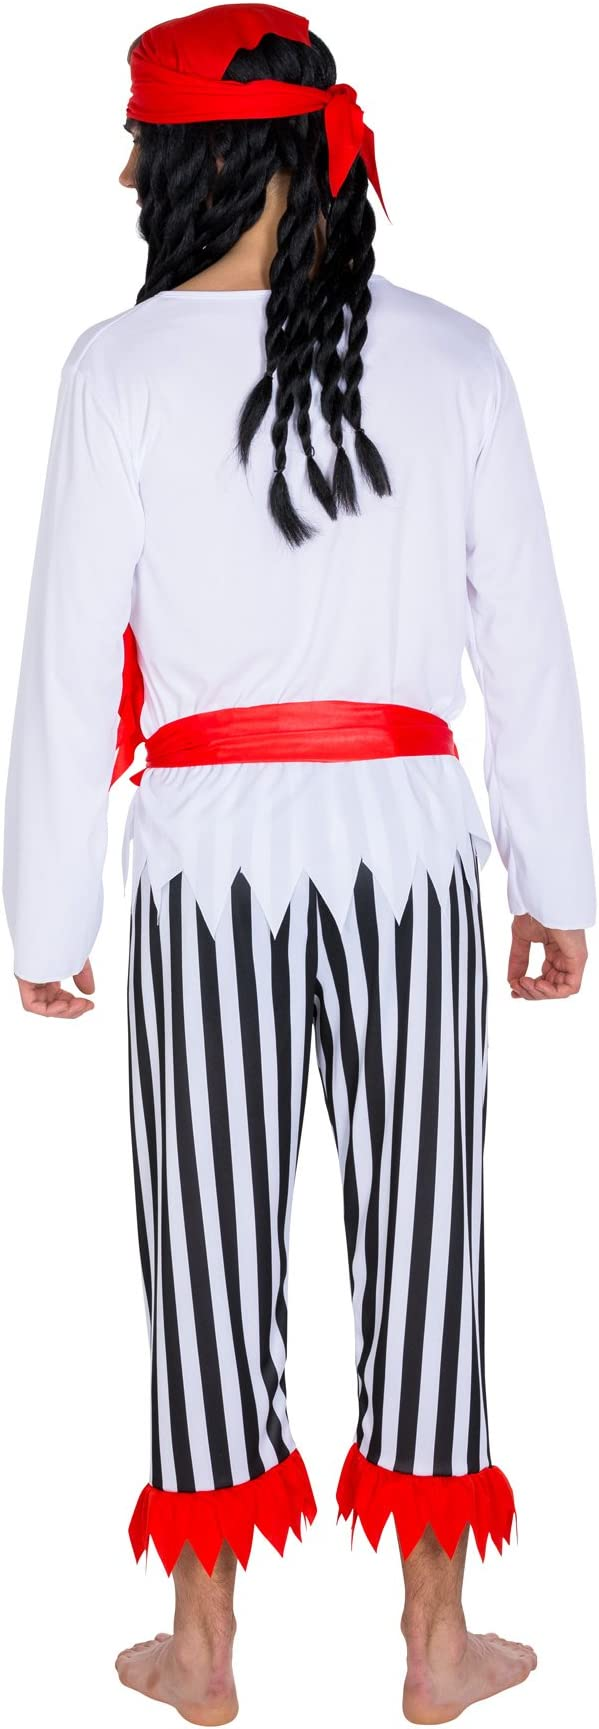 TecTake dressforfun Disfraz de Capitán Pirata bucanero para Hombre | pañuelo Triangular con cinturón Rojo para anudar a la Cintura (L | no. 300703)